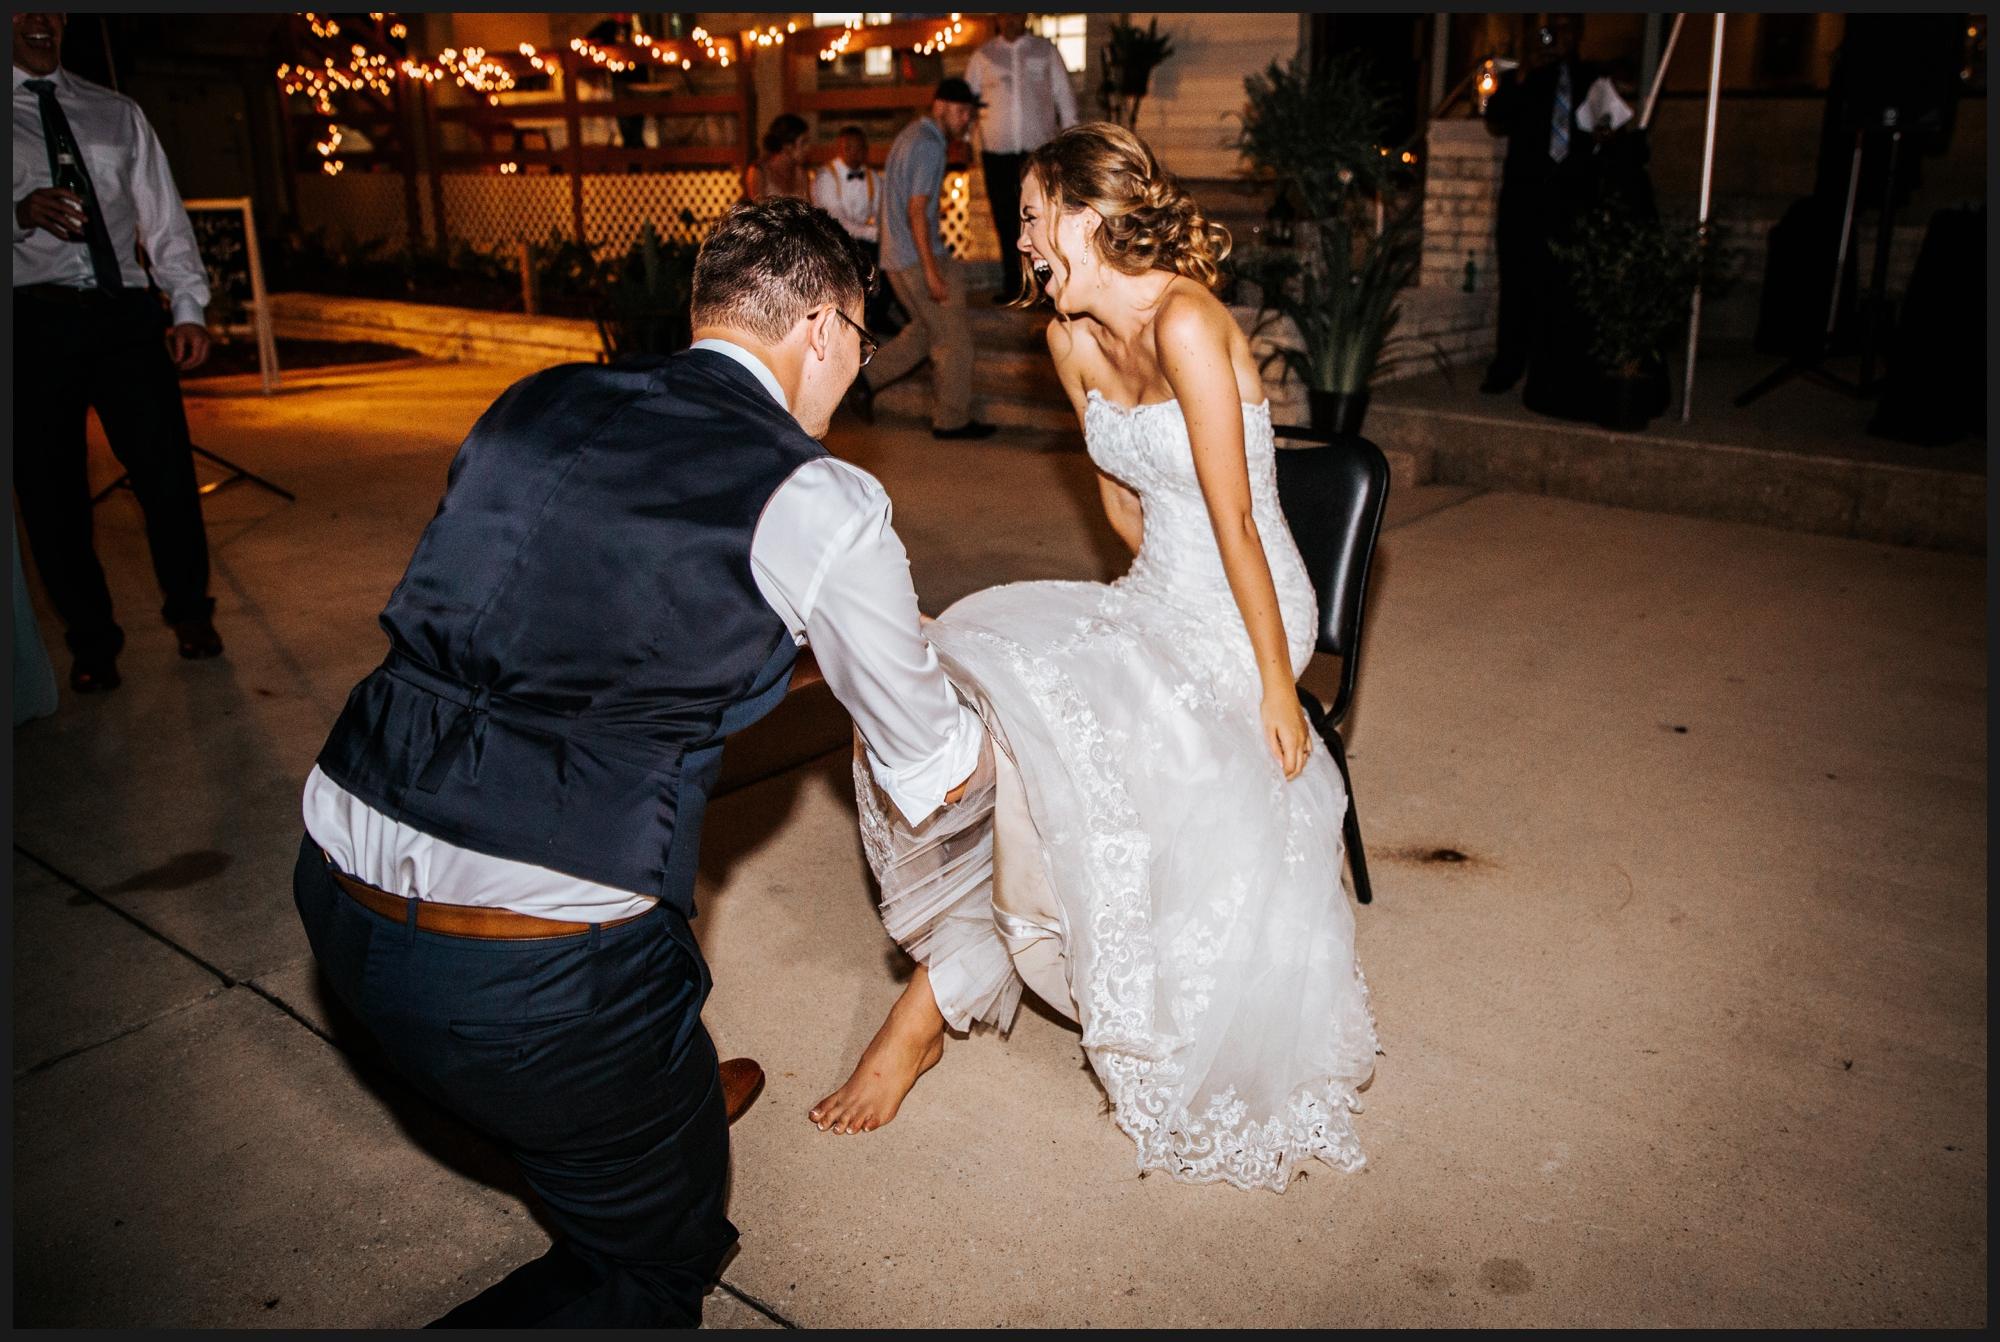 Orlando-Wedding-Photographer-destination-wedding-photographer-florida-wedding-photographer-bohemian-wedding-photographer_0131.jpg